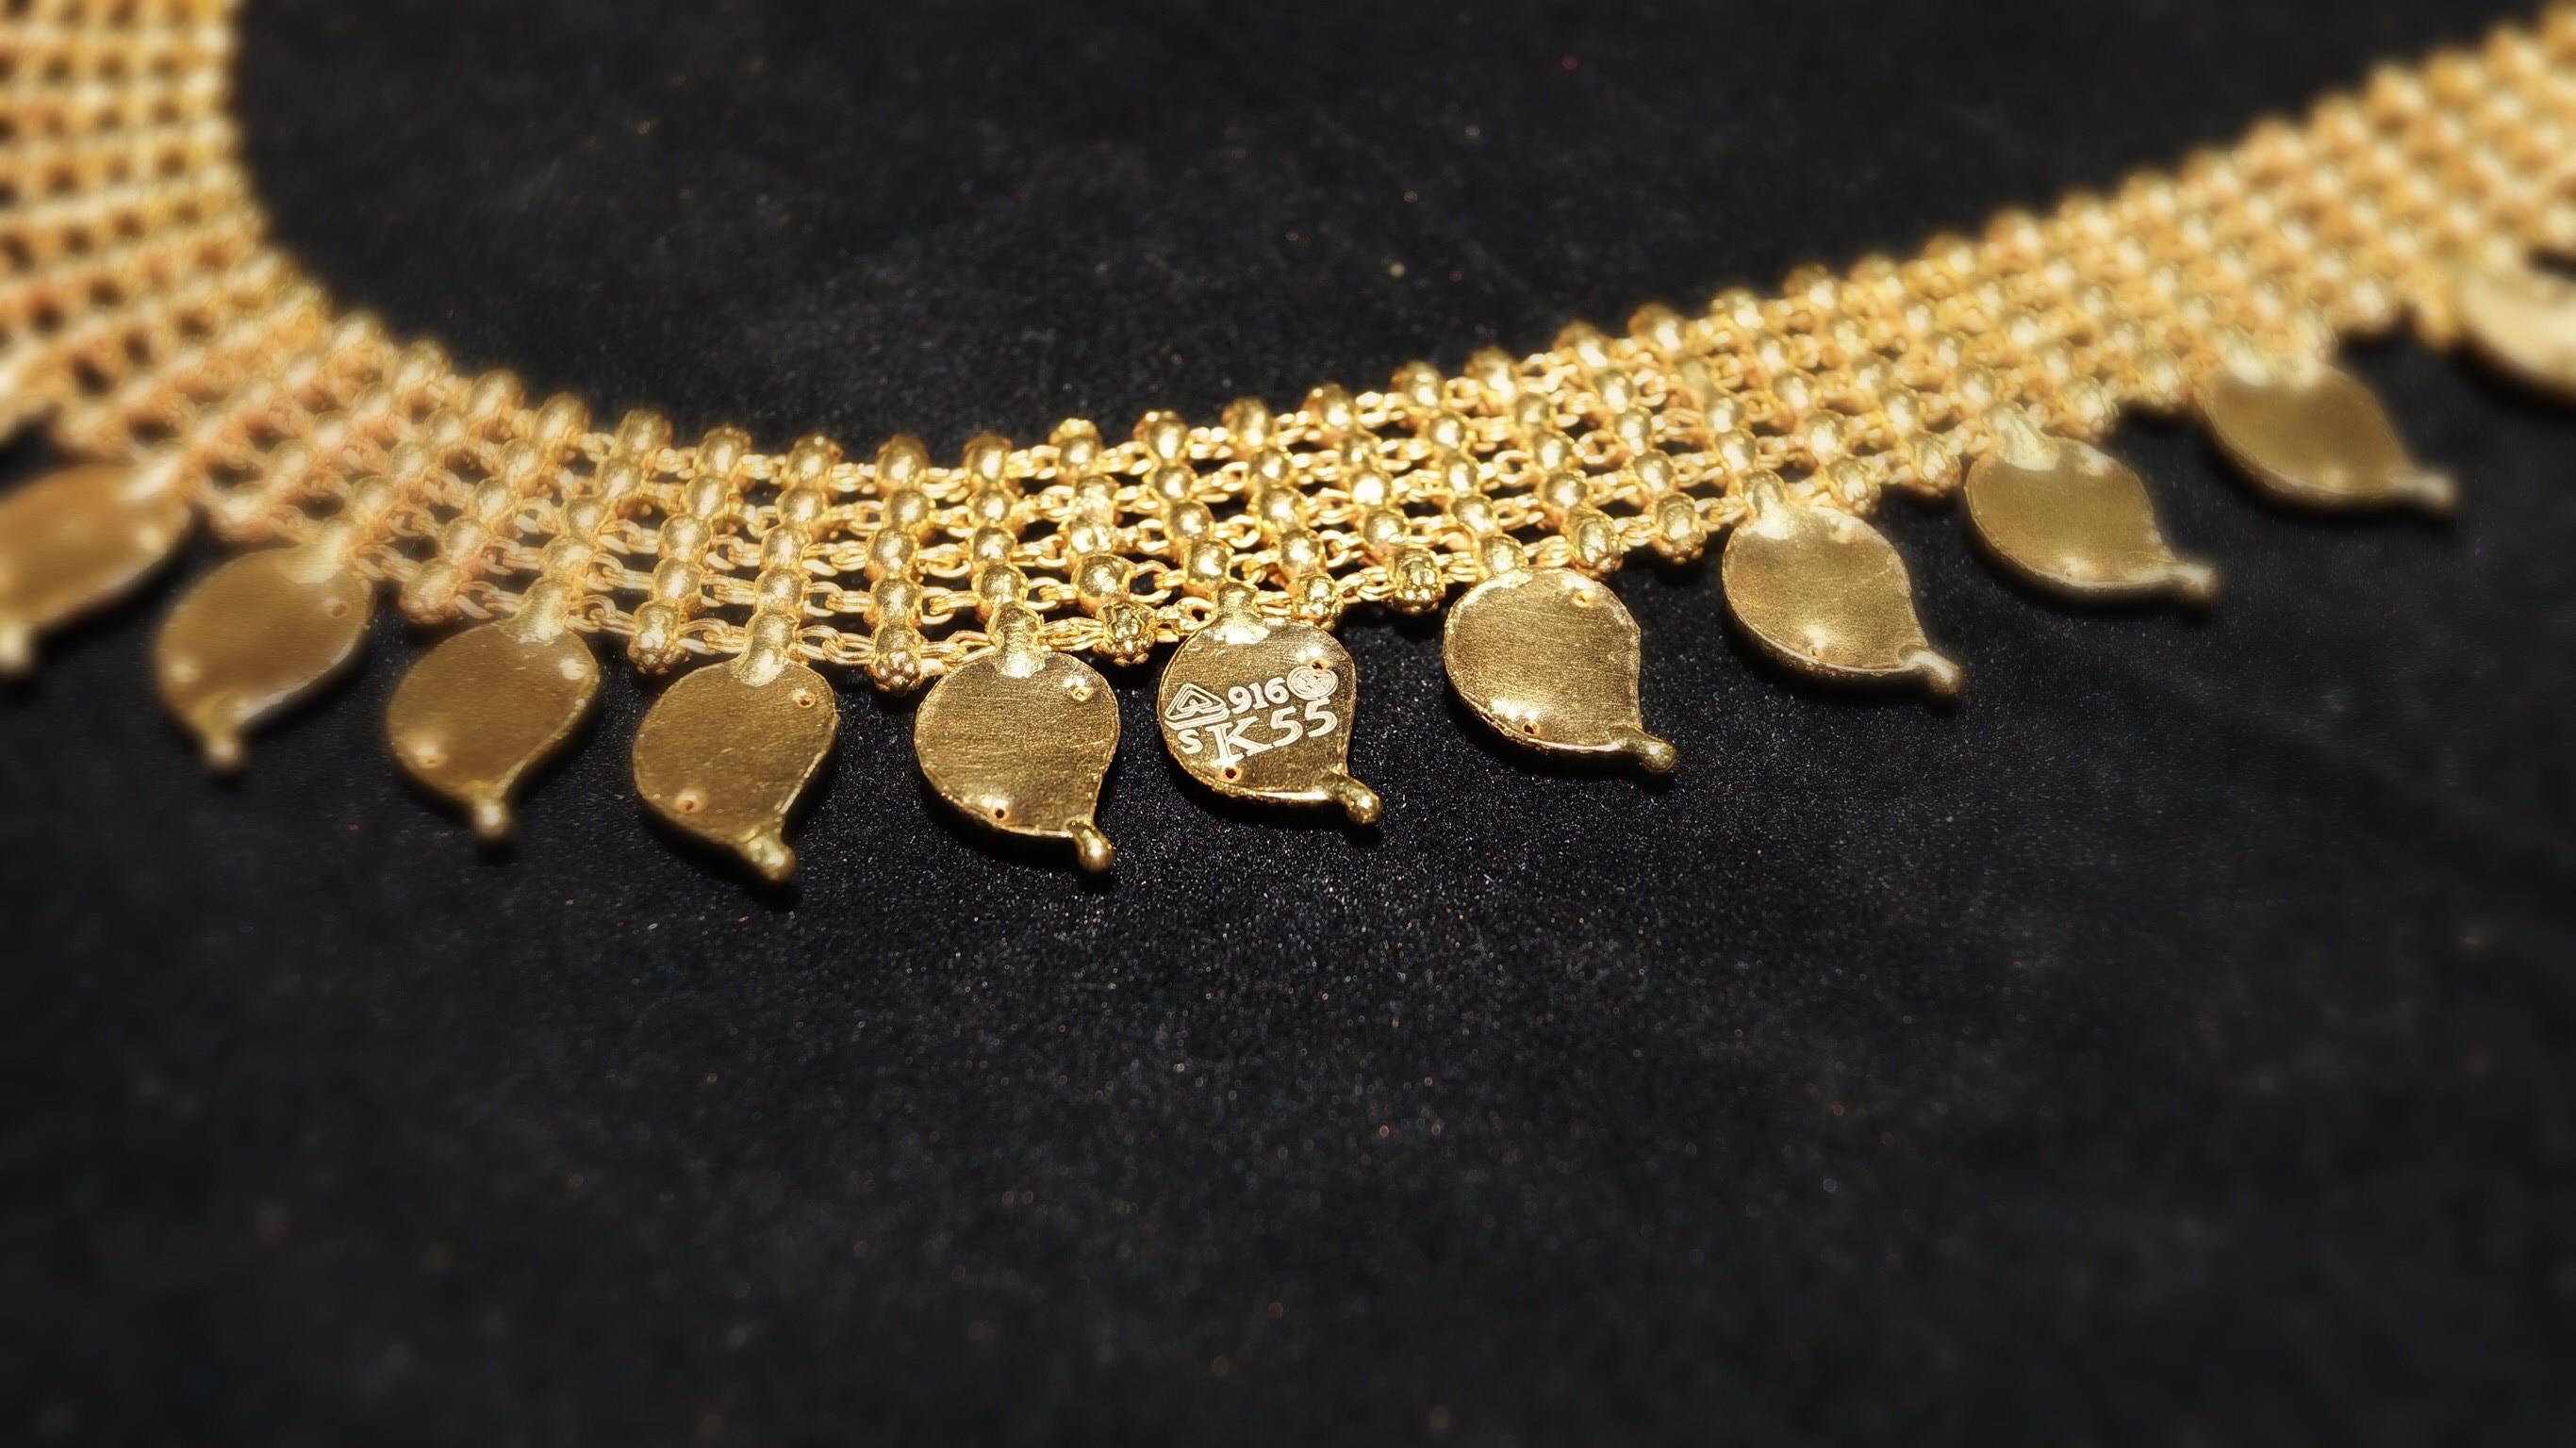 916 Gold Jewellery i